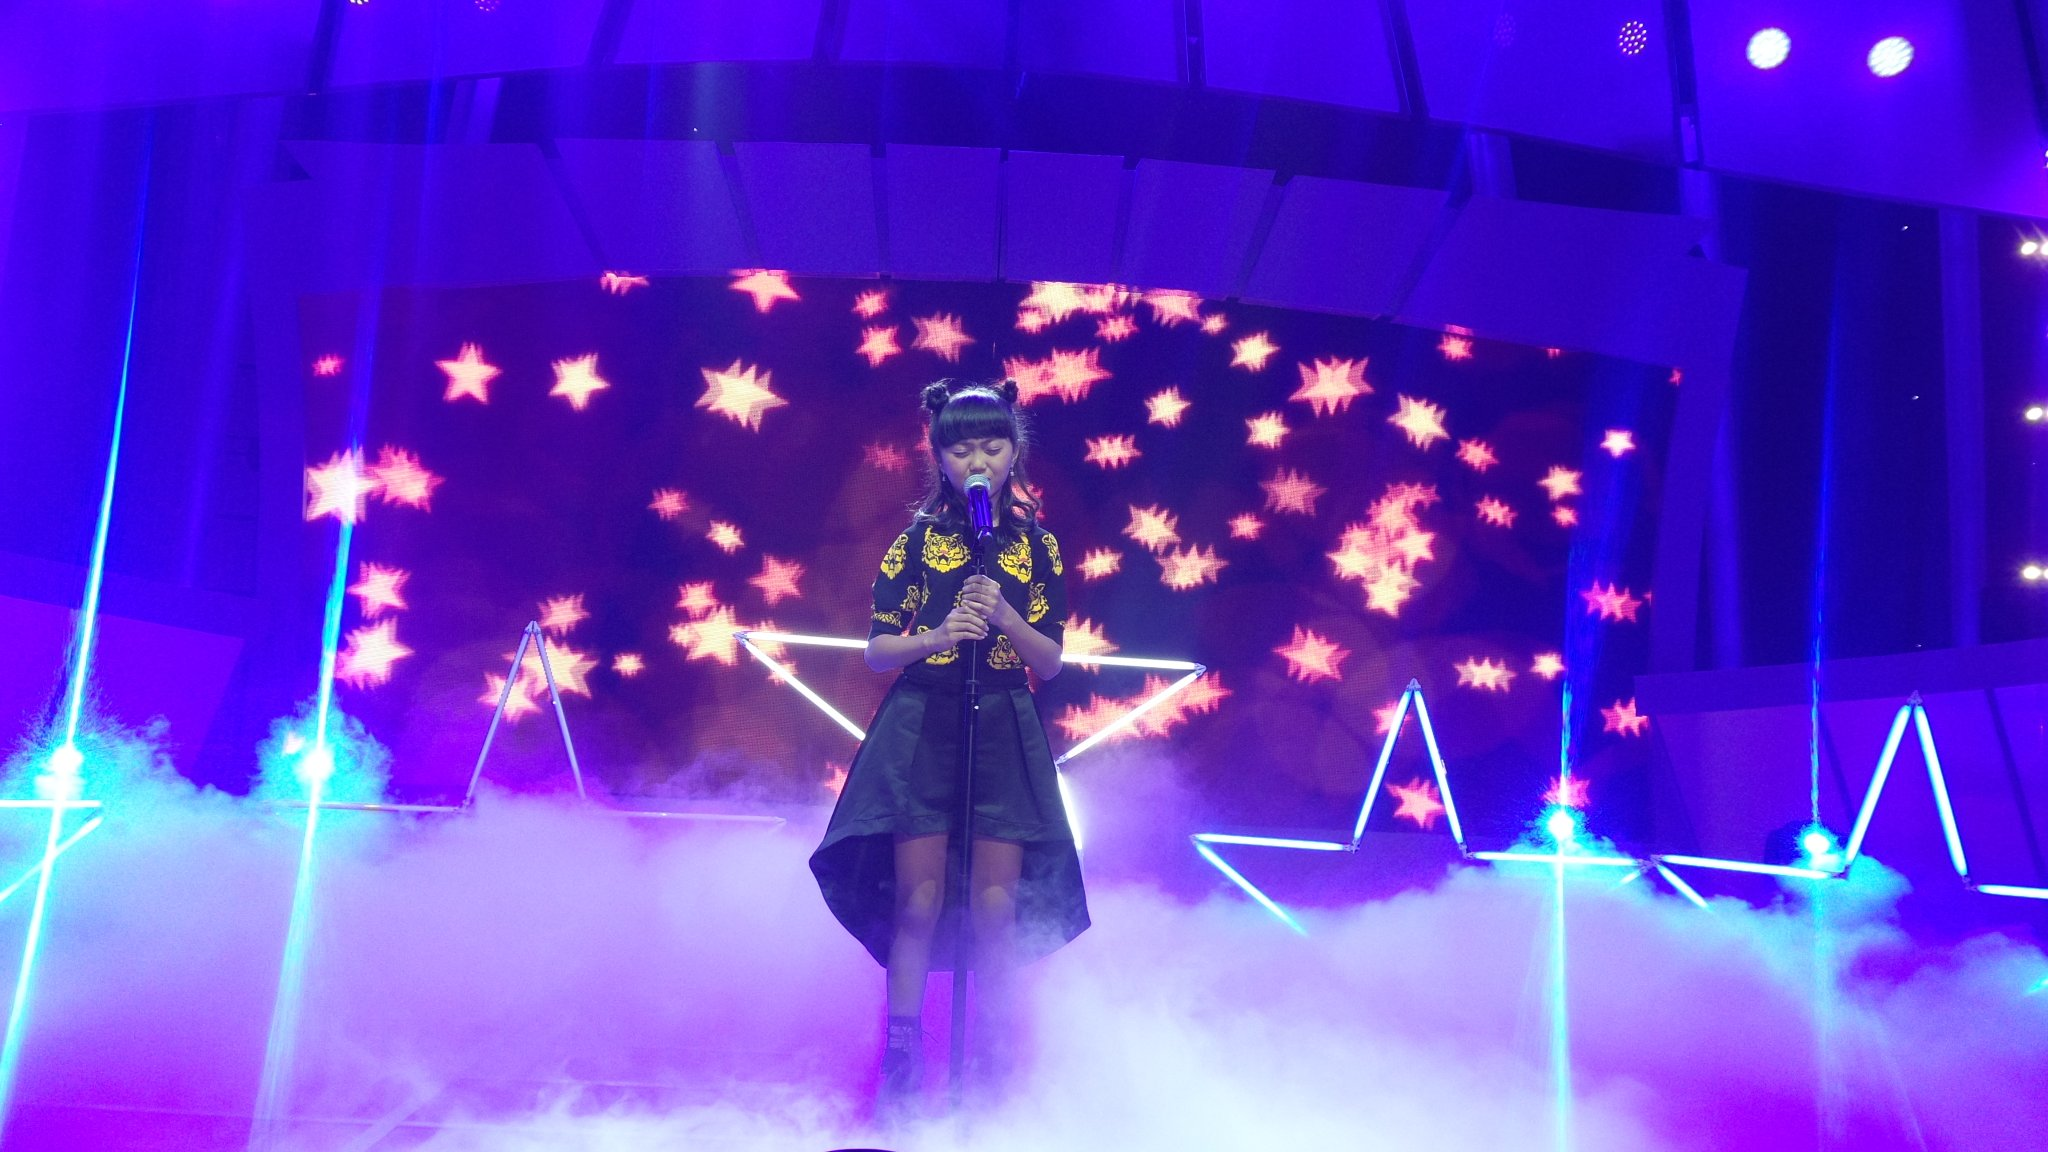 If i were a boy di bawakan dengan suara yg sgt spektakuler @SharonIdolJr #IdolJrDuetStar @Official_MNCTV https://t.co/JRbh9F4O0G